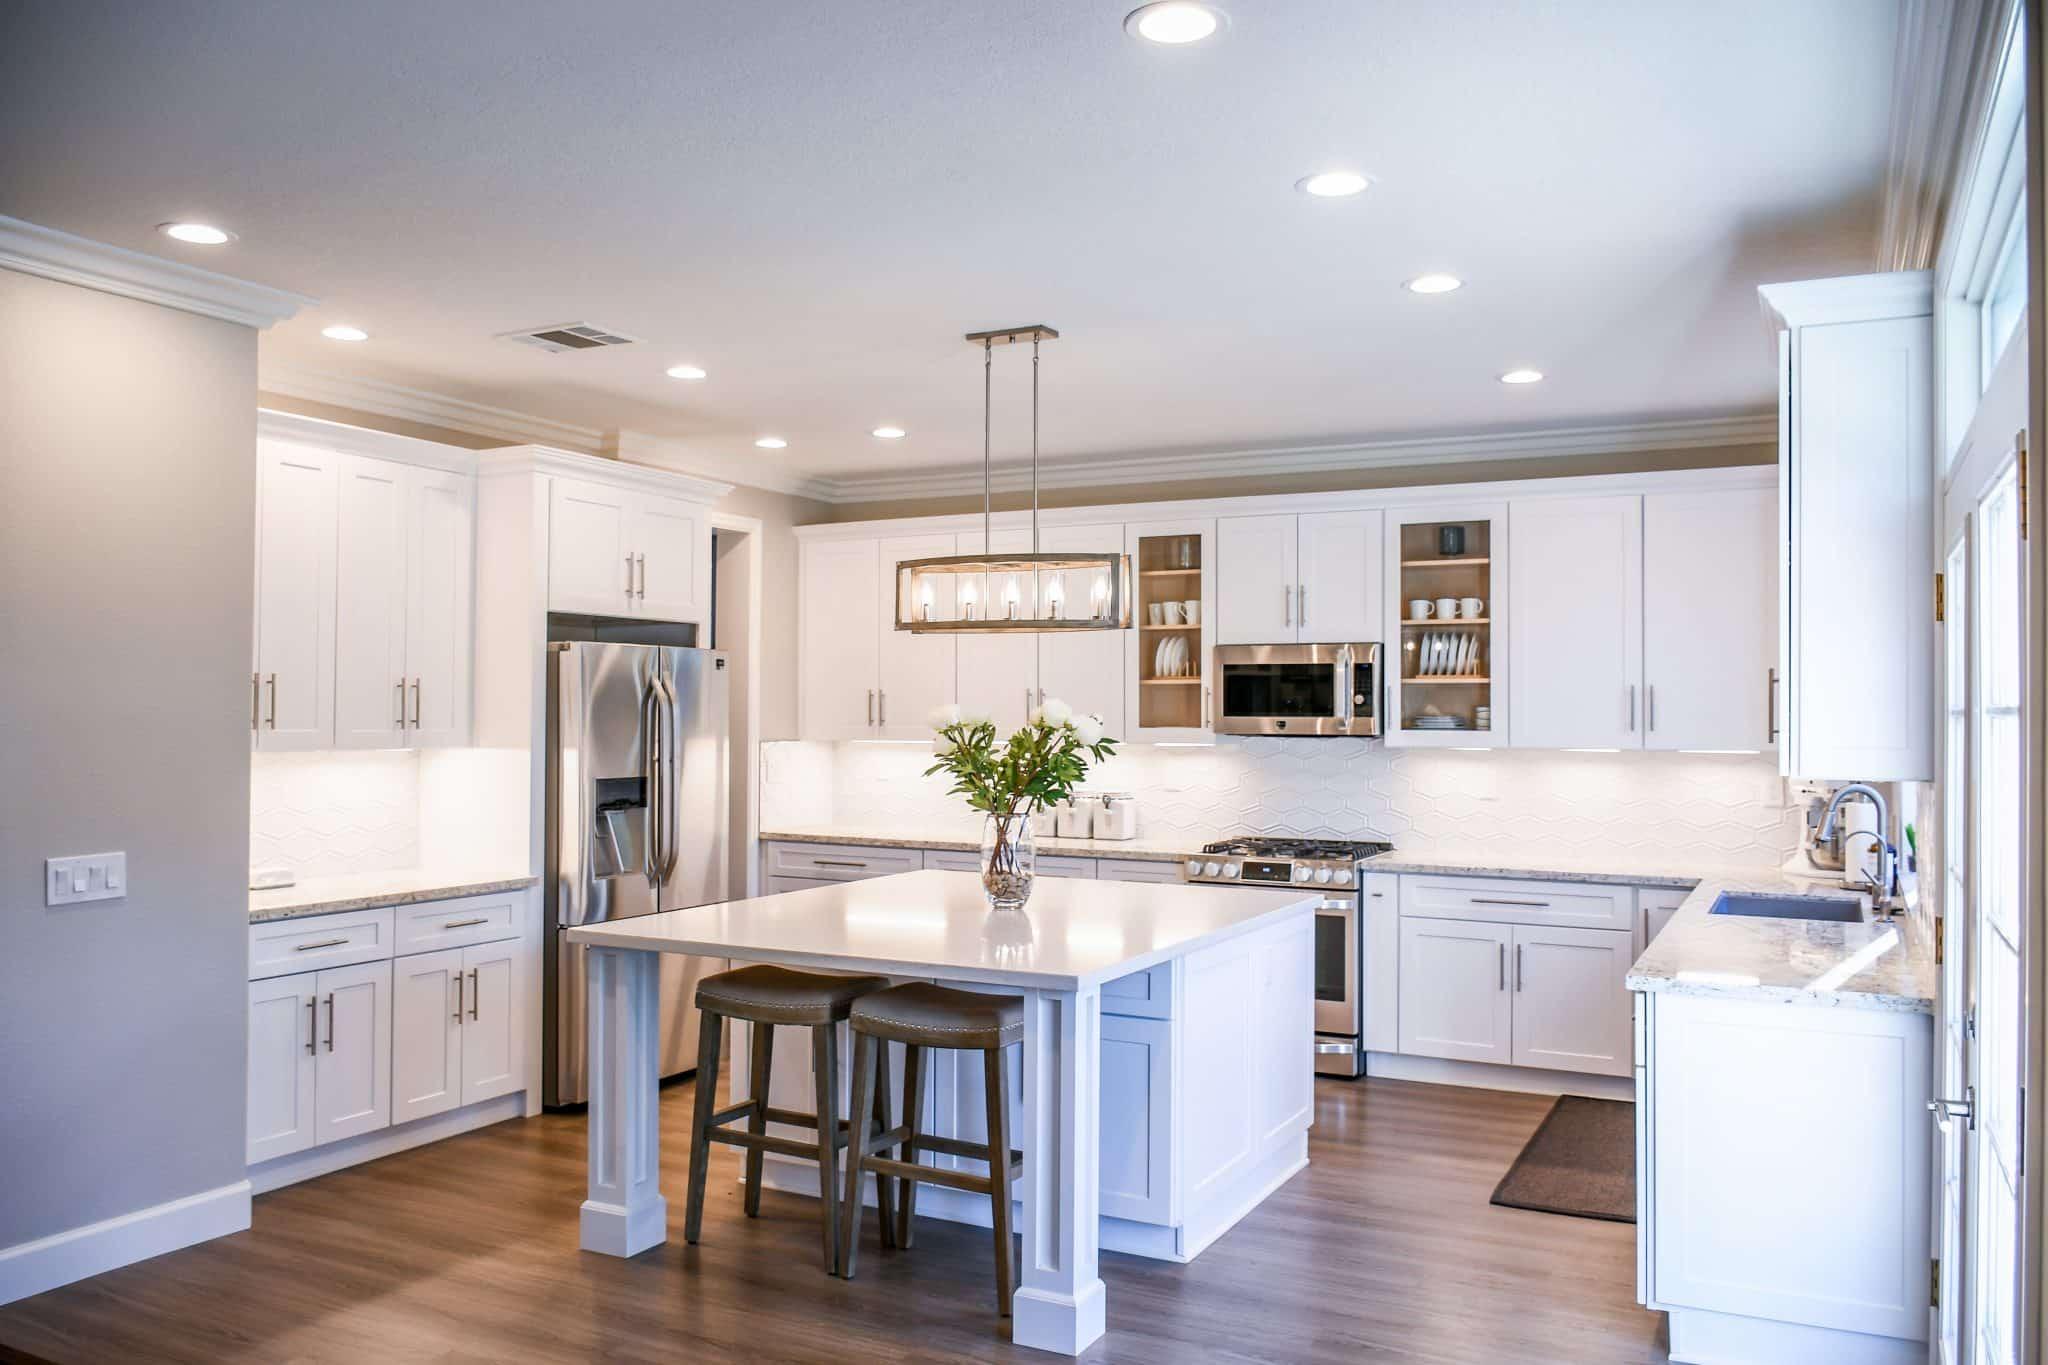 Fall Appliance Checklist